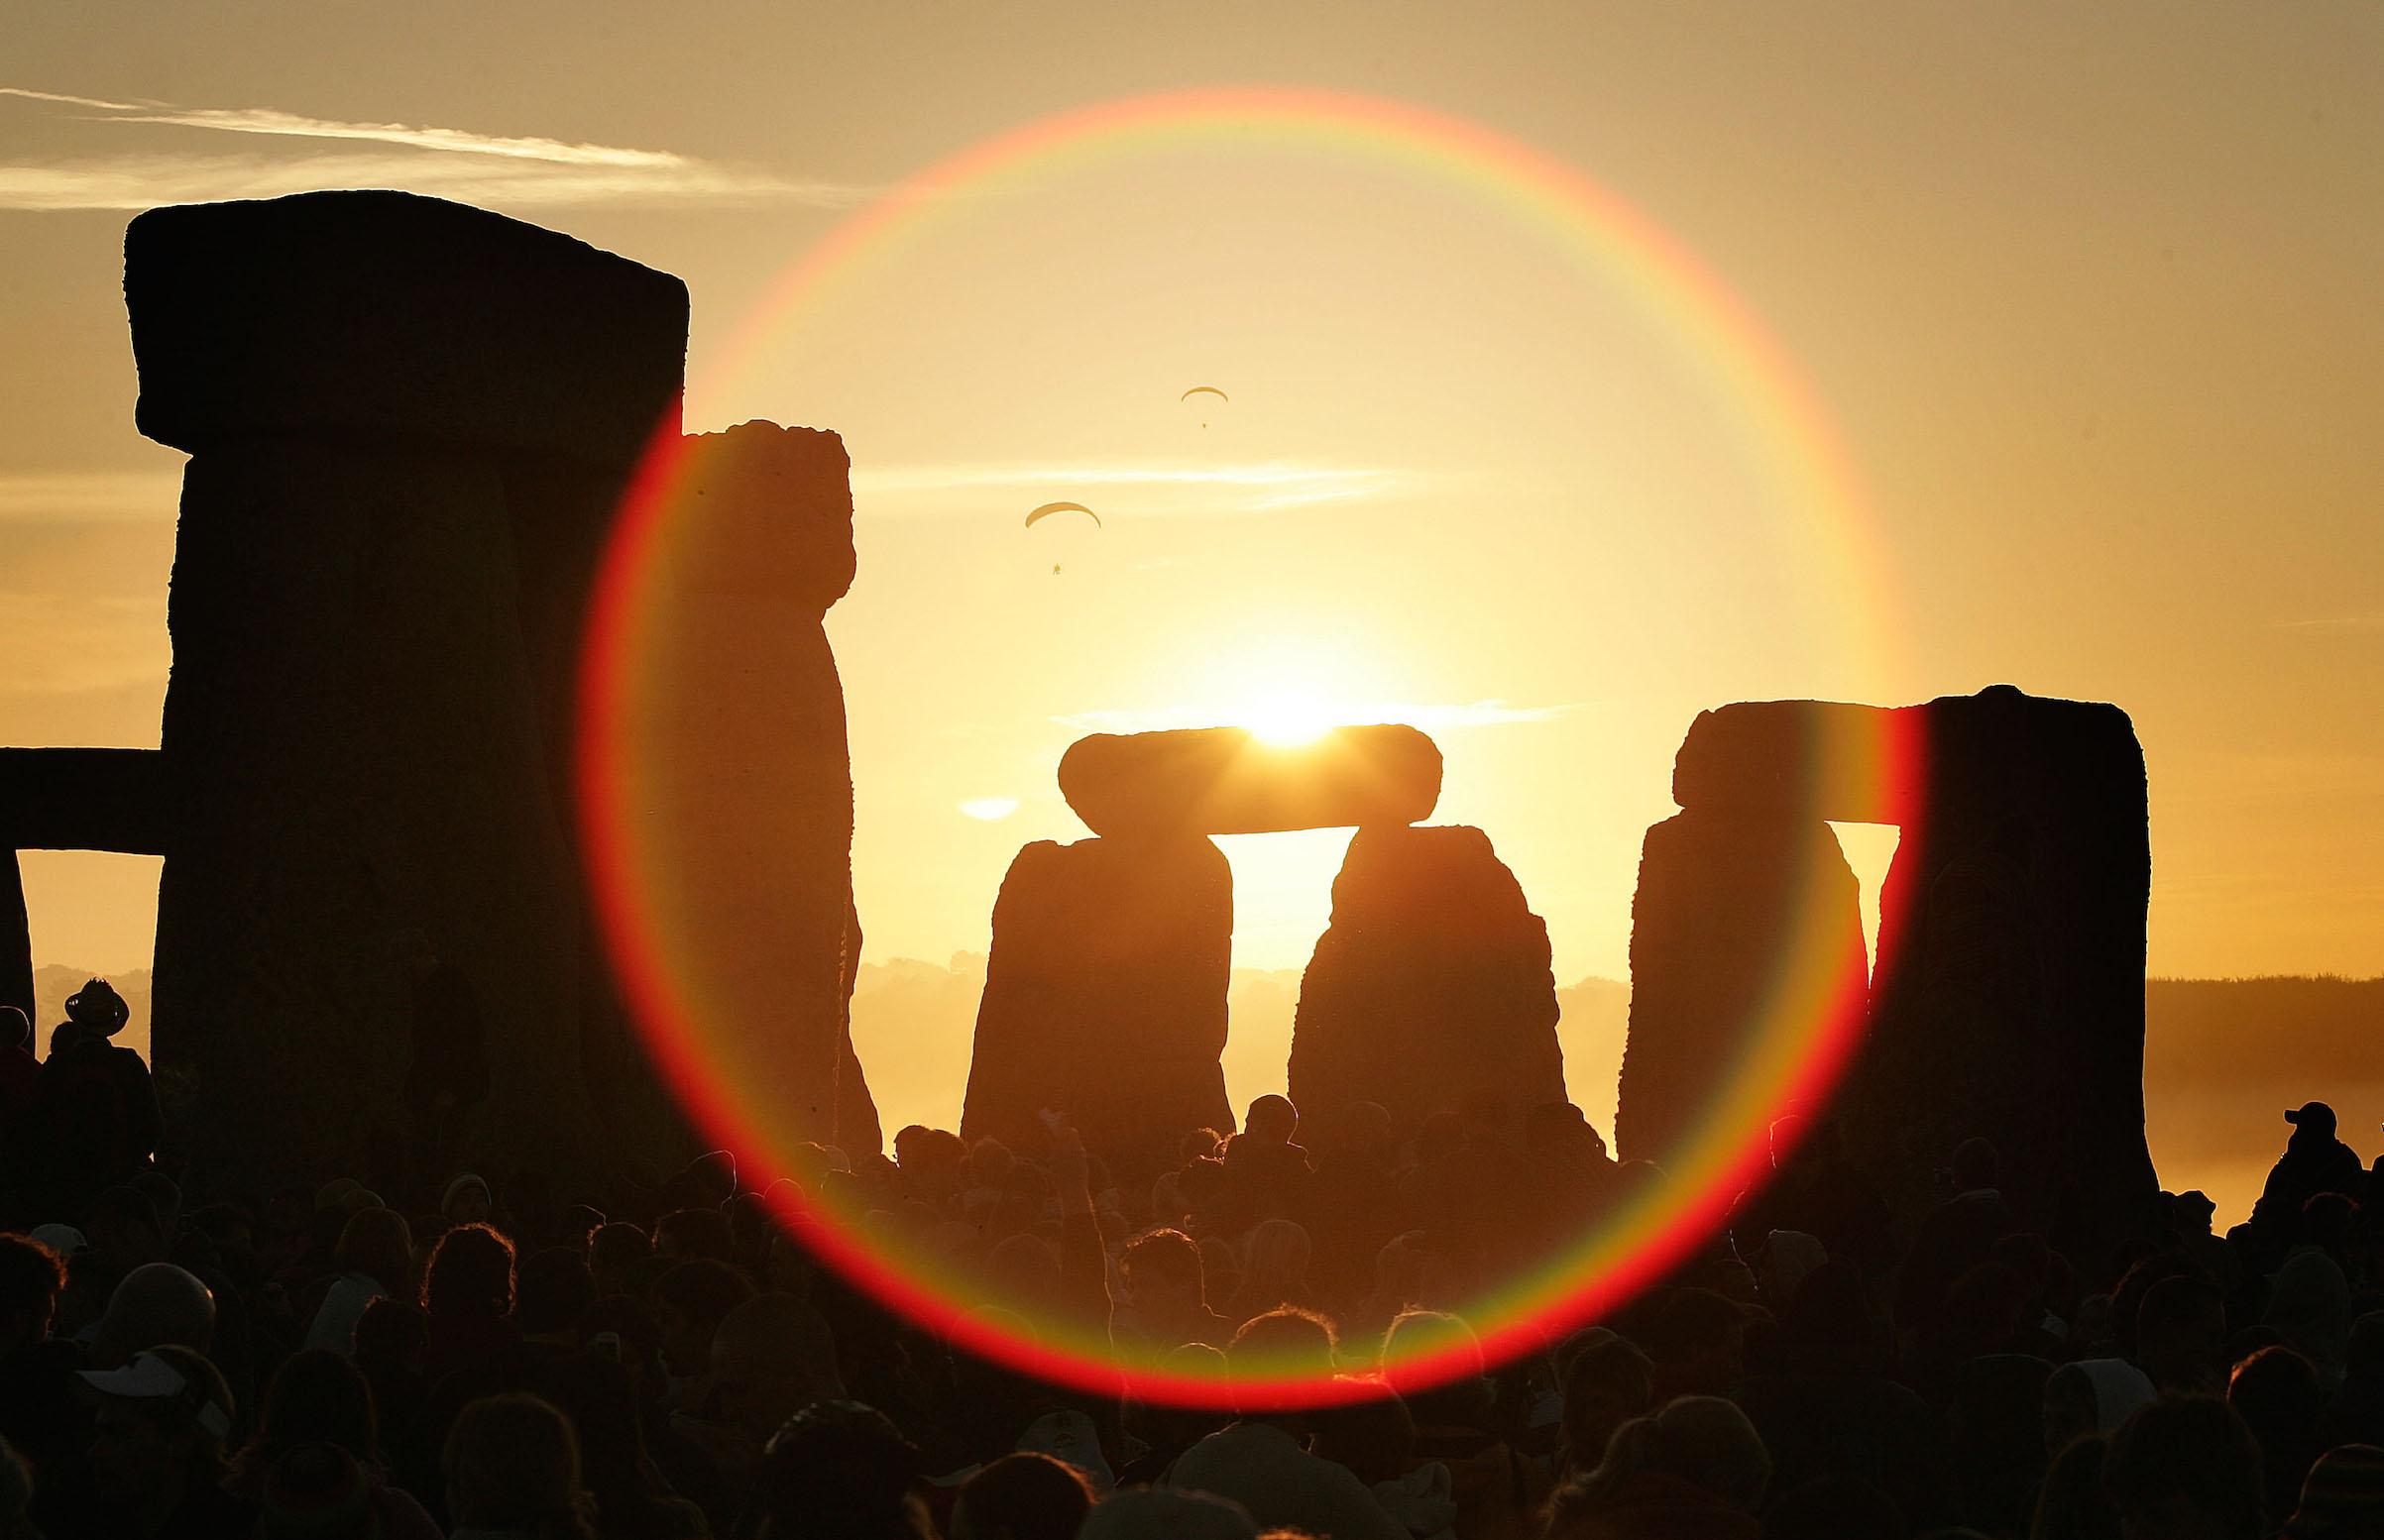 stonehenge felfedezes kore digitalis napfordulo